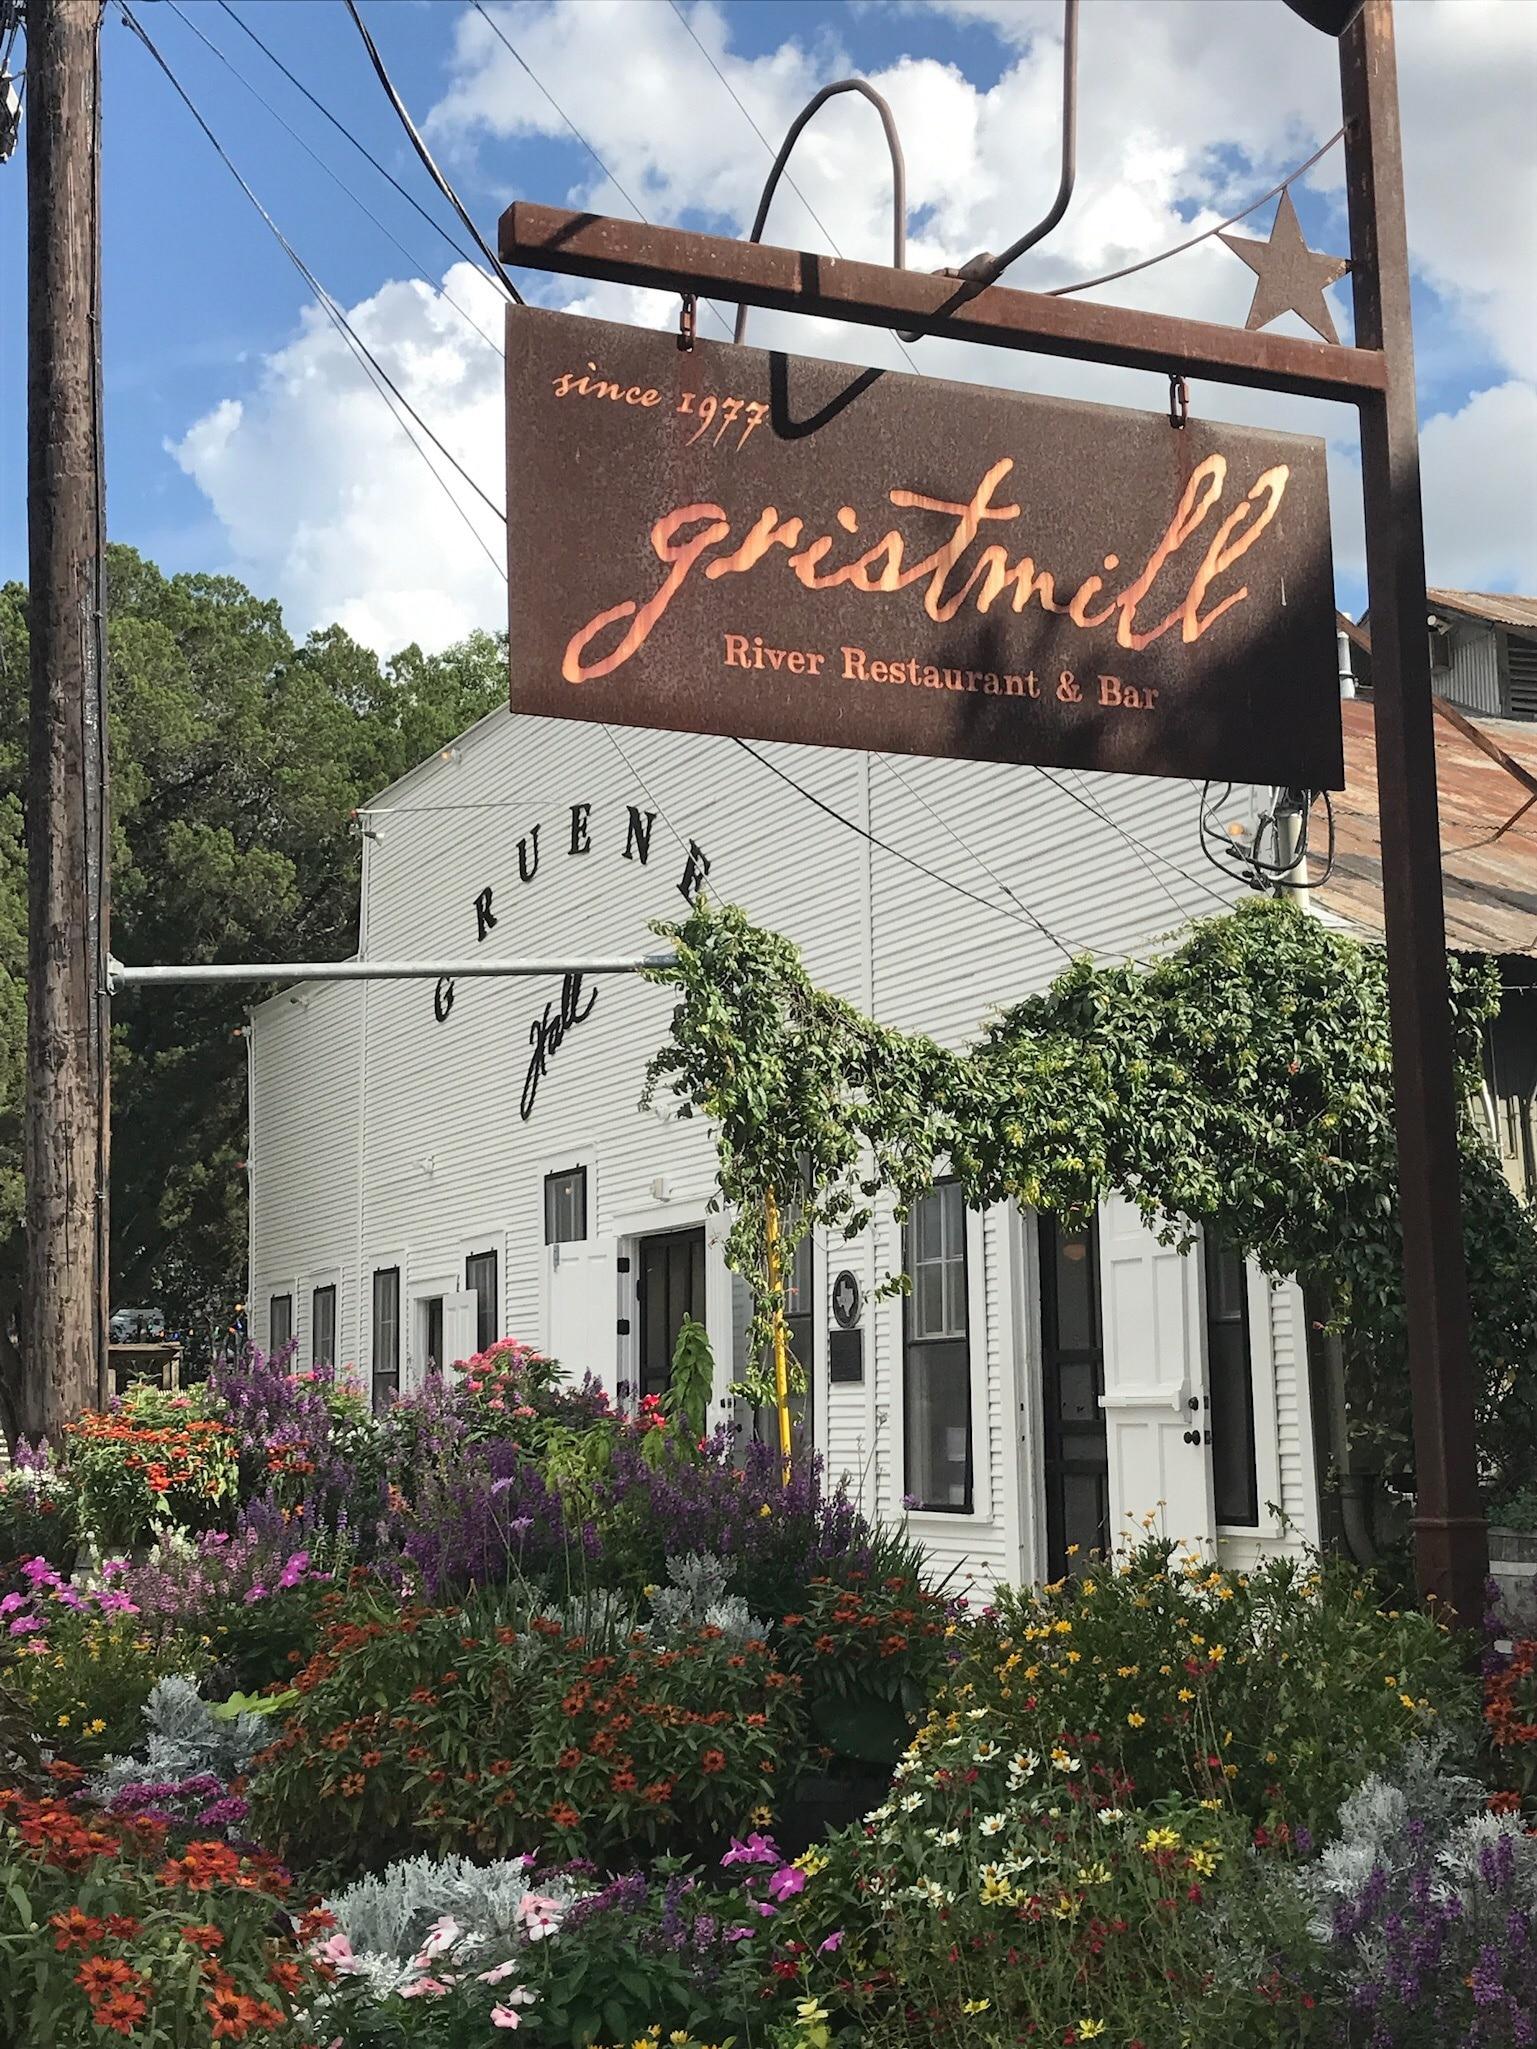 Gruene Hall, New Braunfels, Texas, United States of America